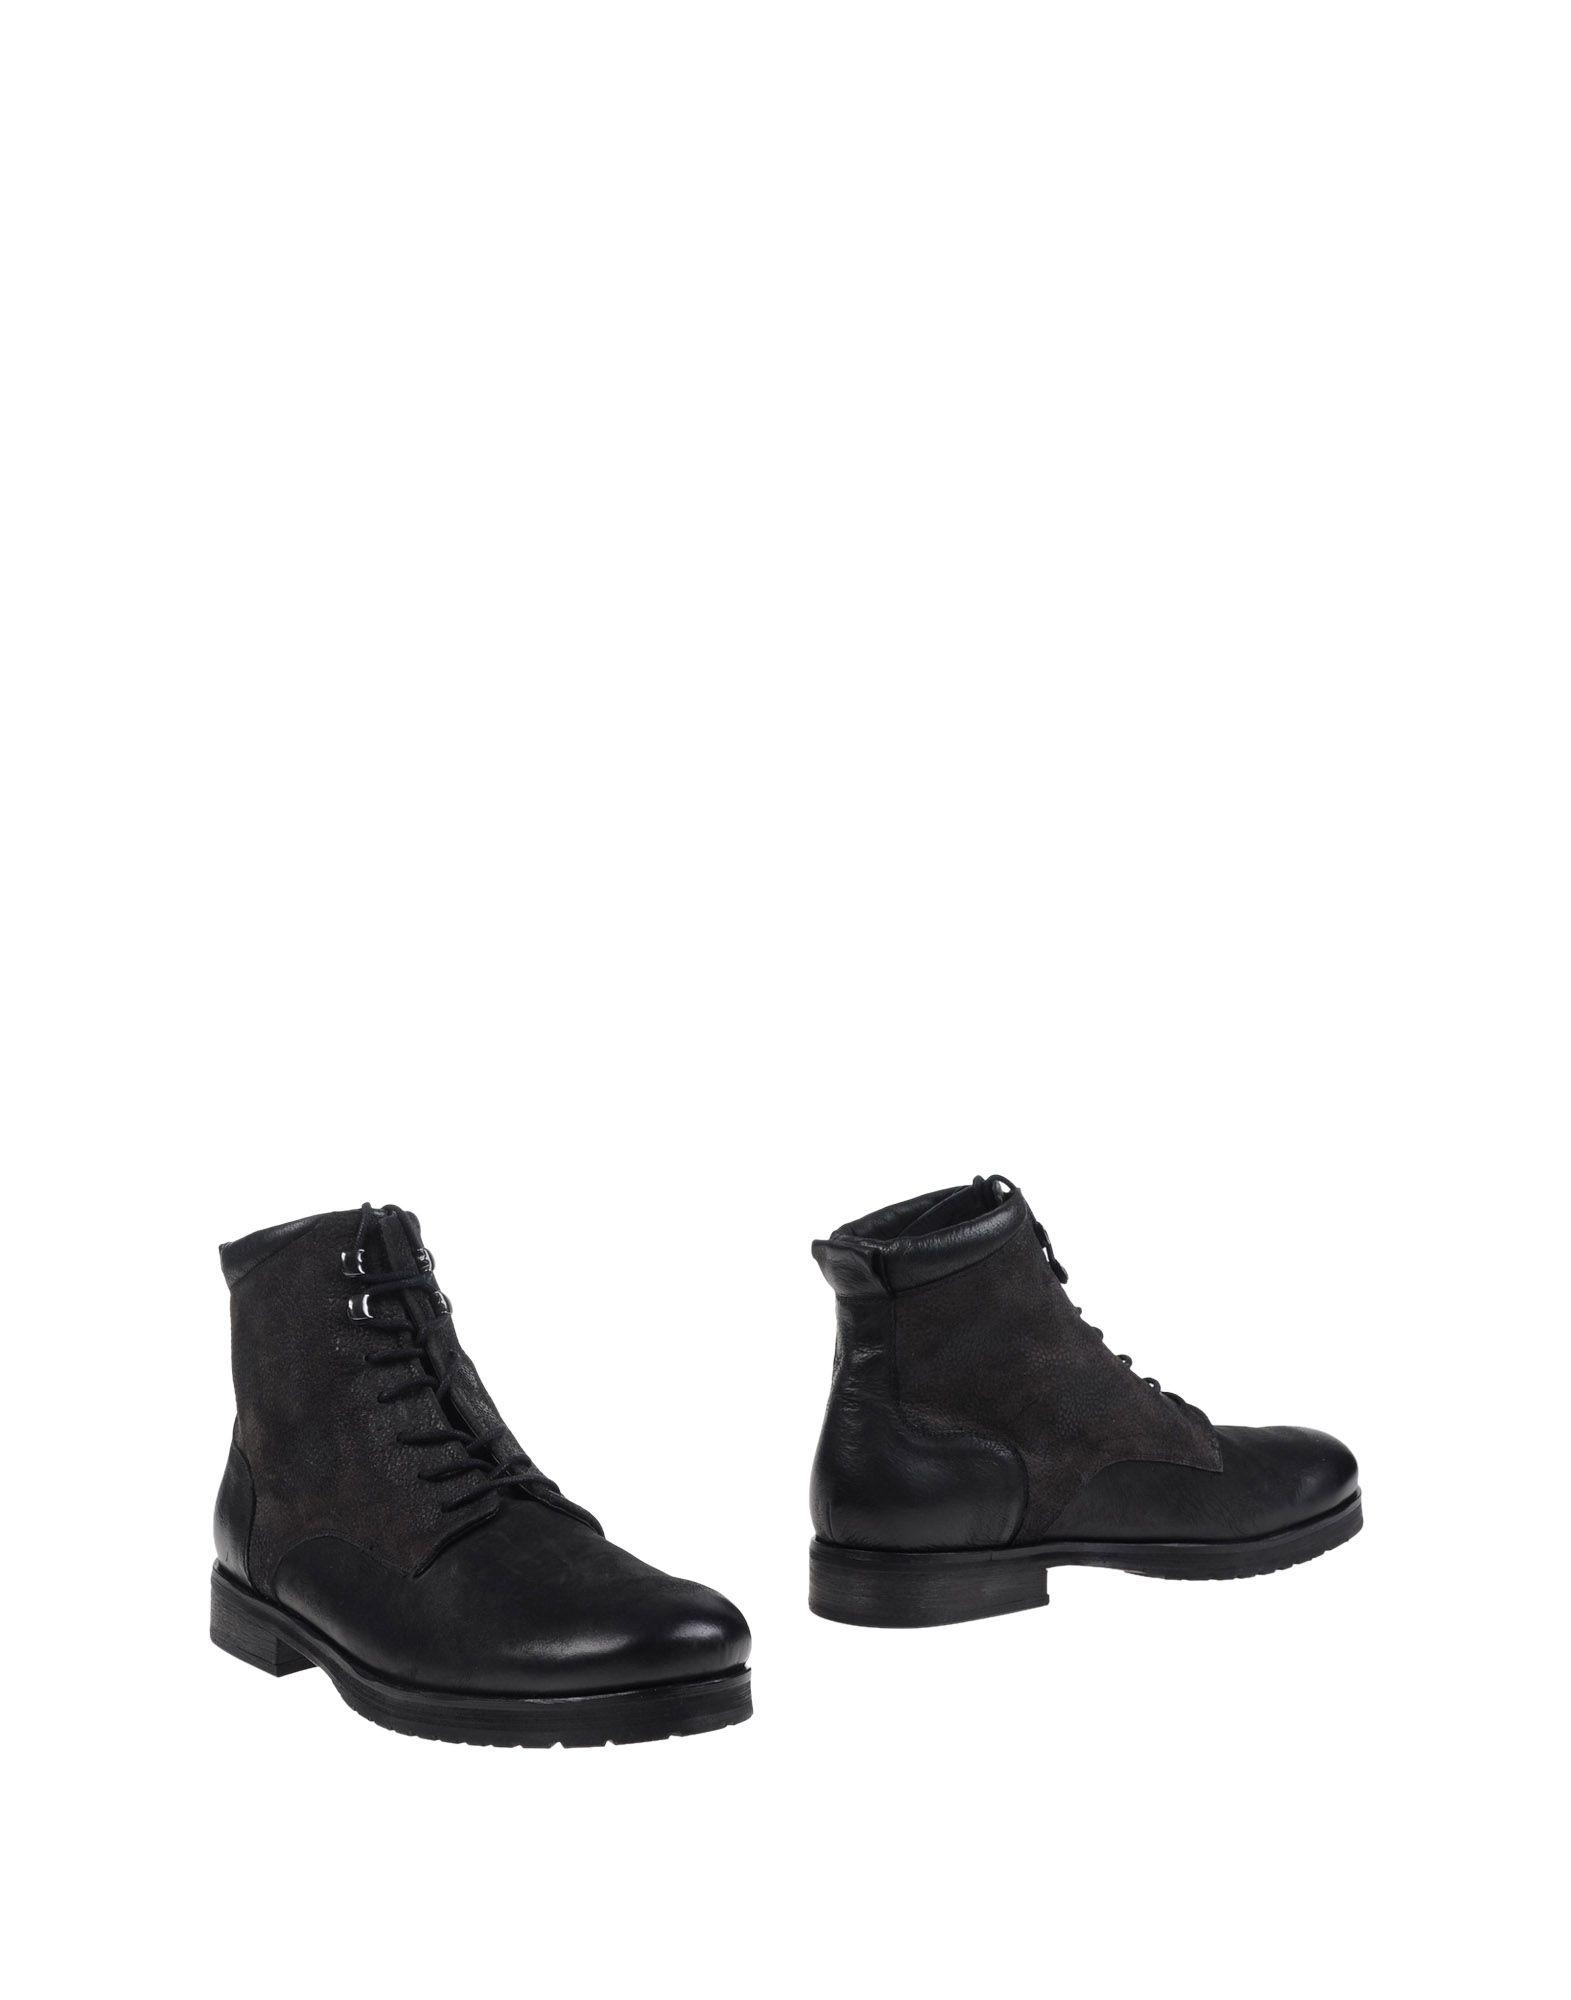 Rabatt echte Schuhe Crime London 11078567SC Stiefelette Herren  11078567SC London c7c752